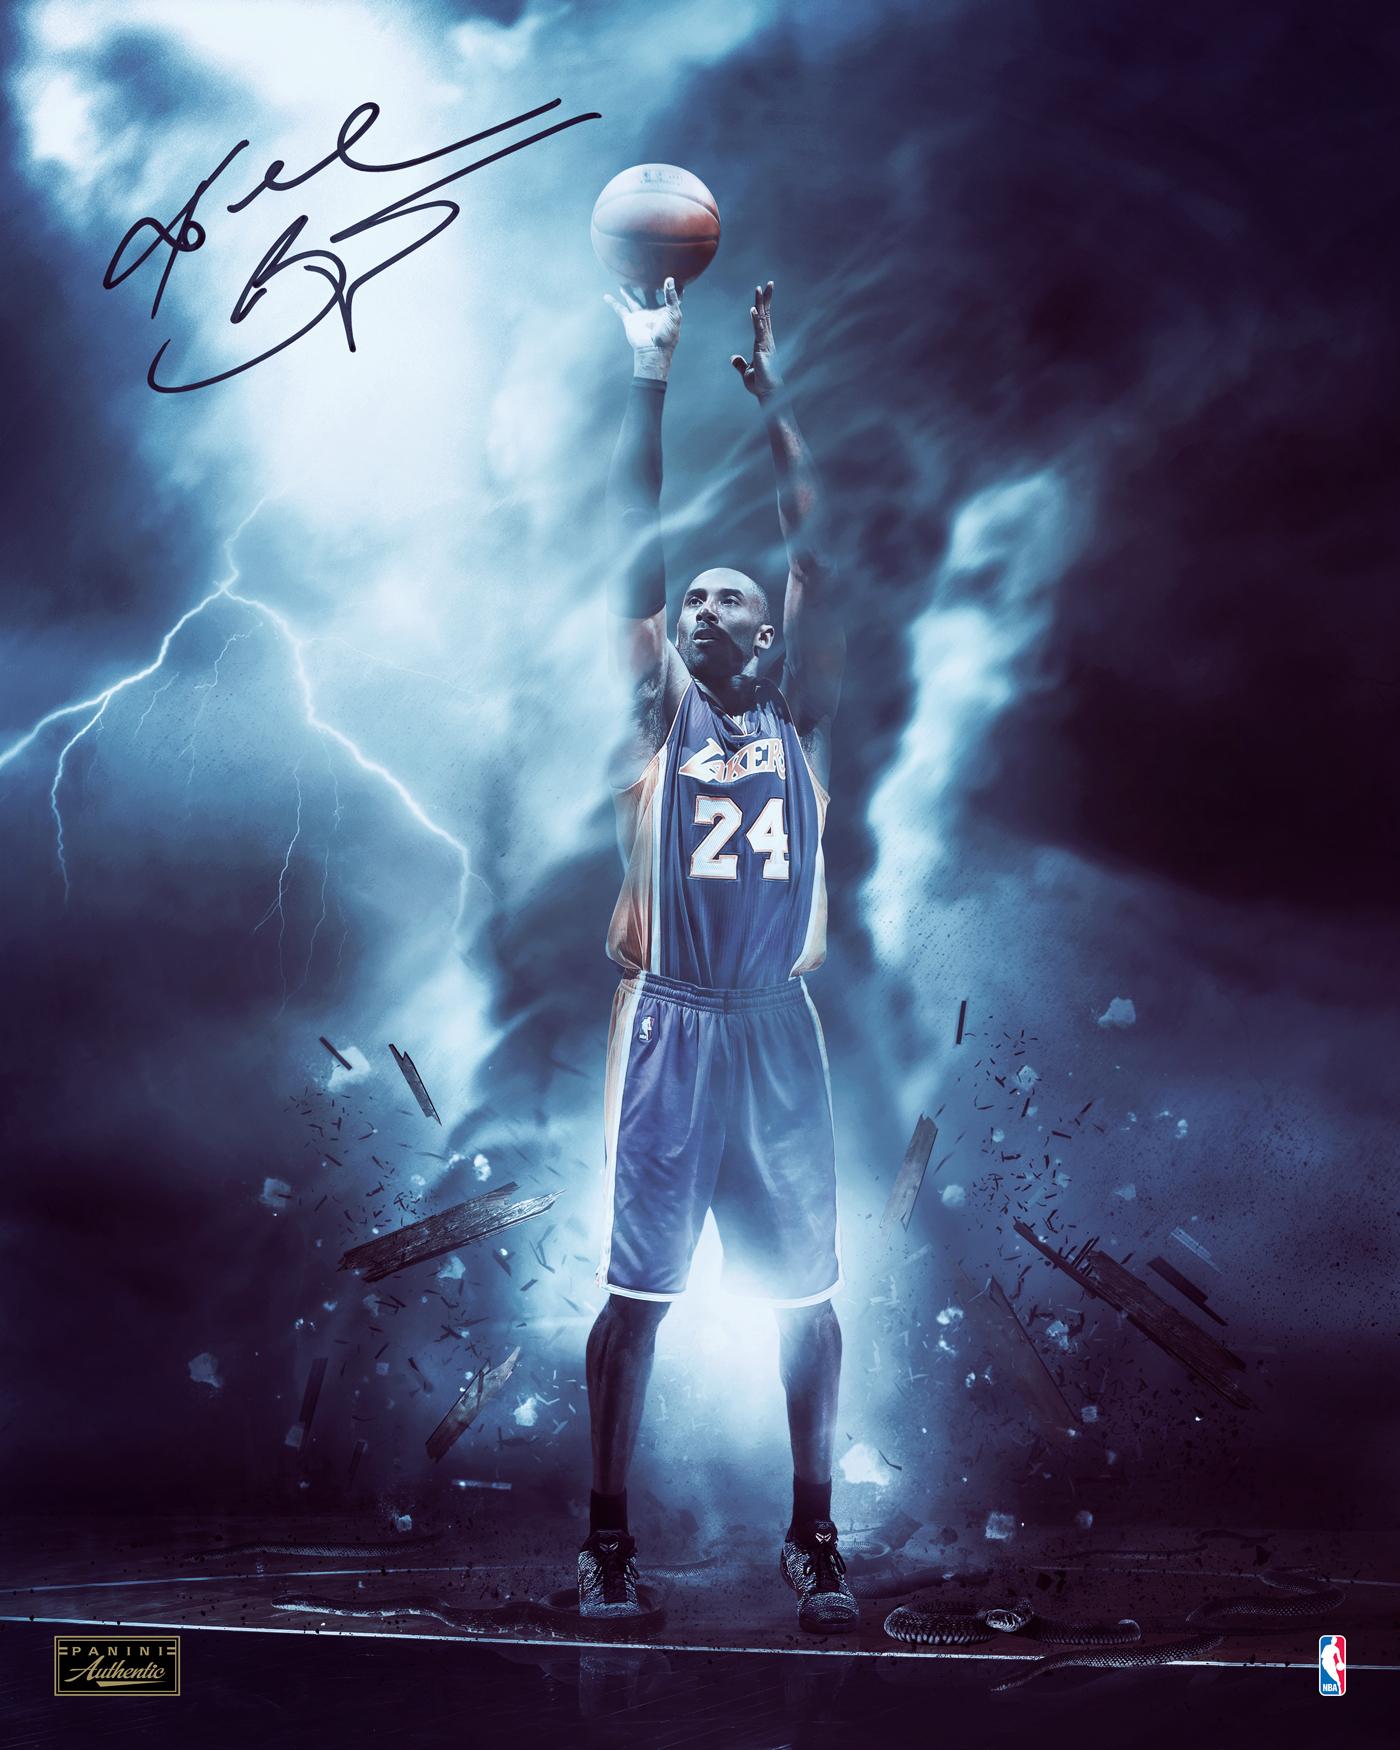 Kobe Bryant panini Authentic memorabilia NBA Lakers sport basketball kobe black mamba